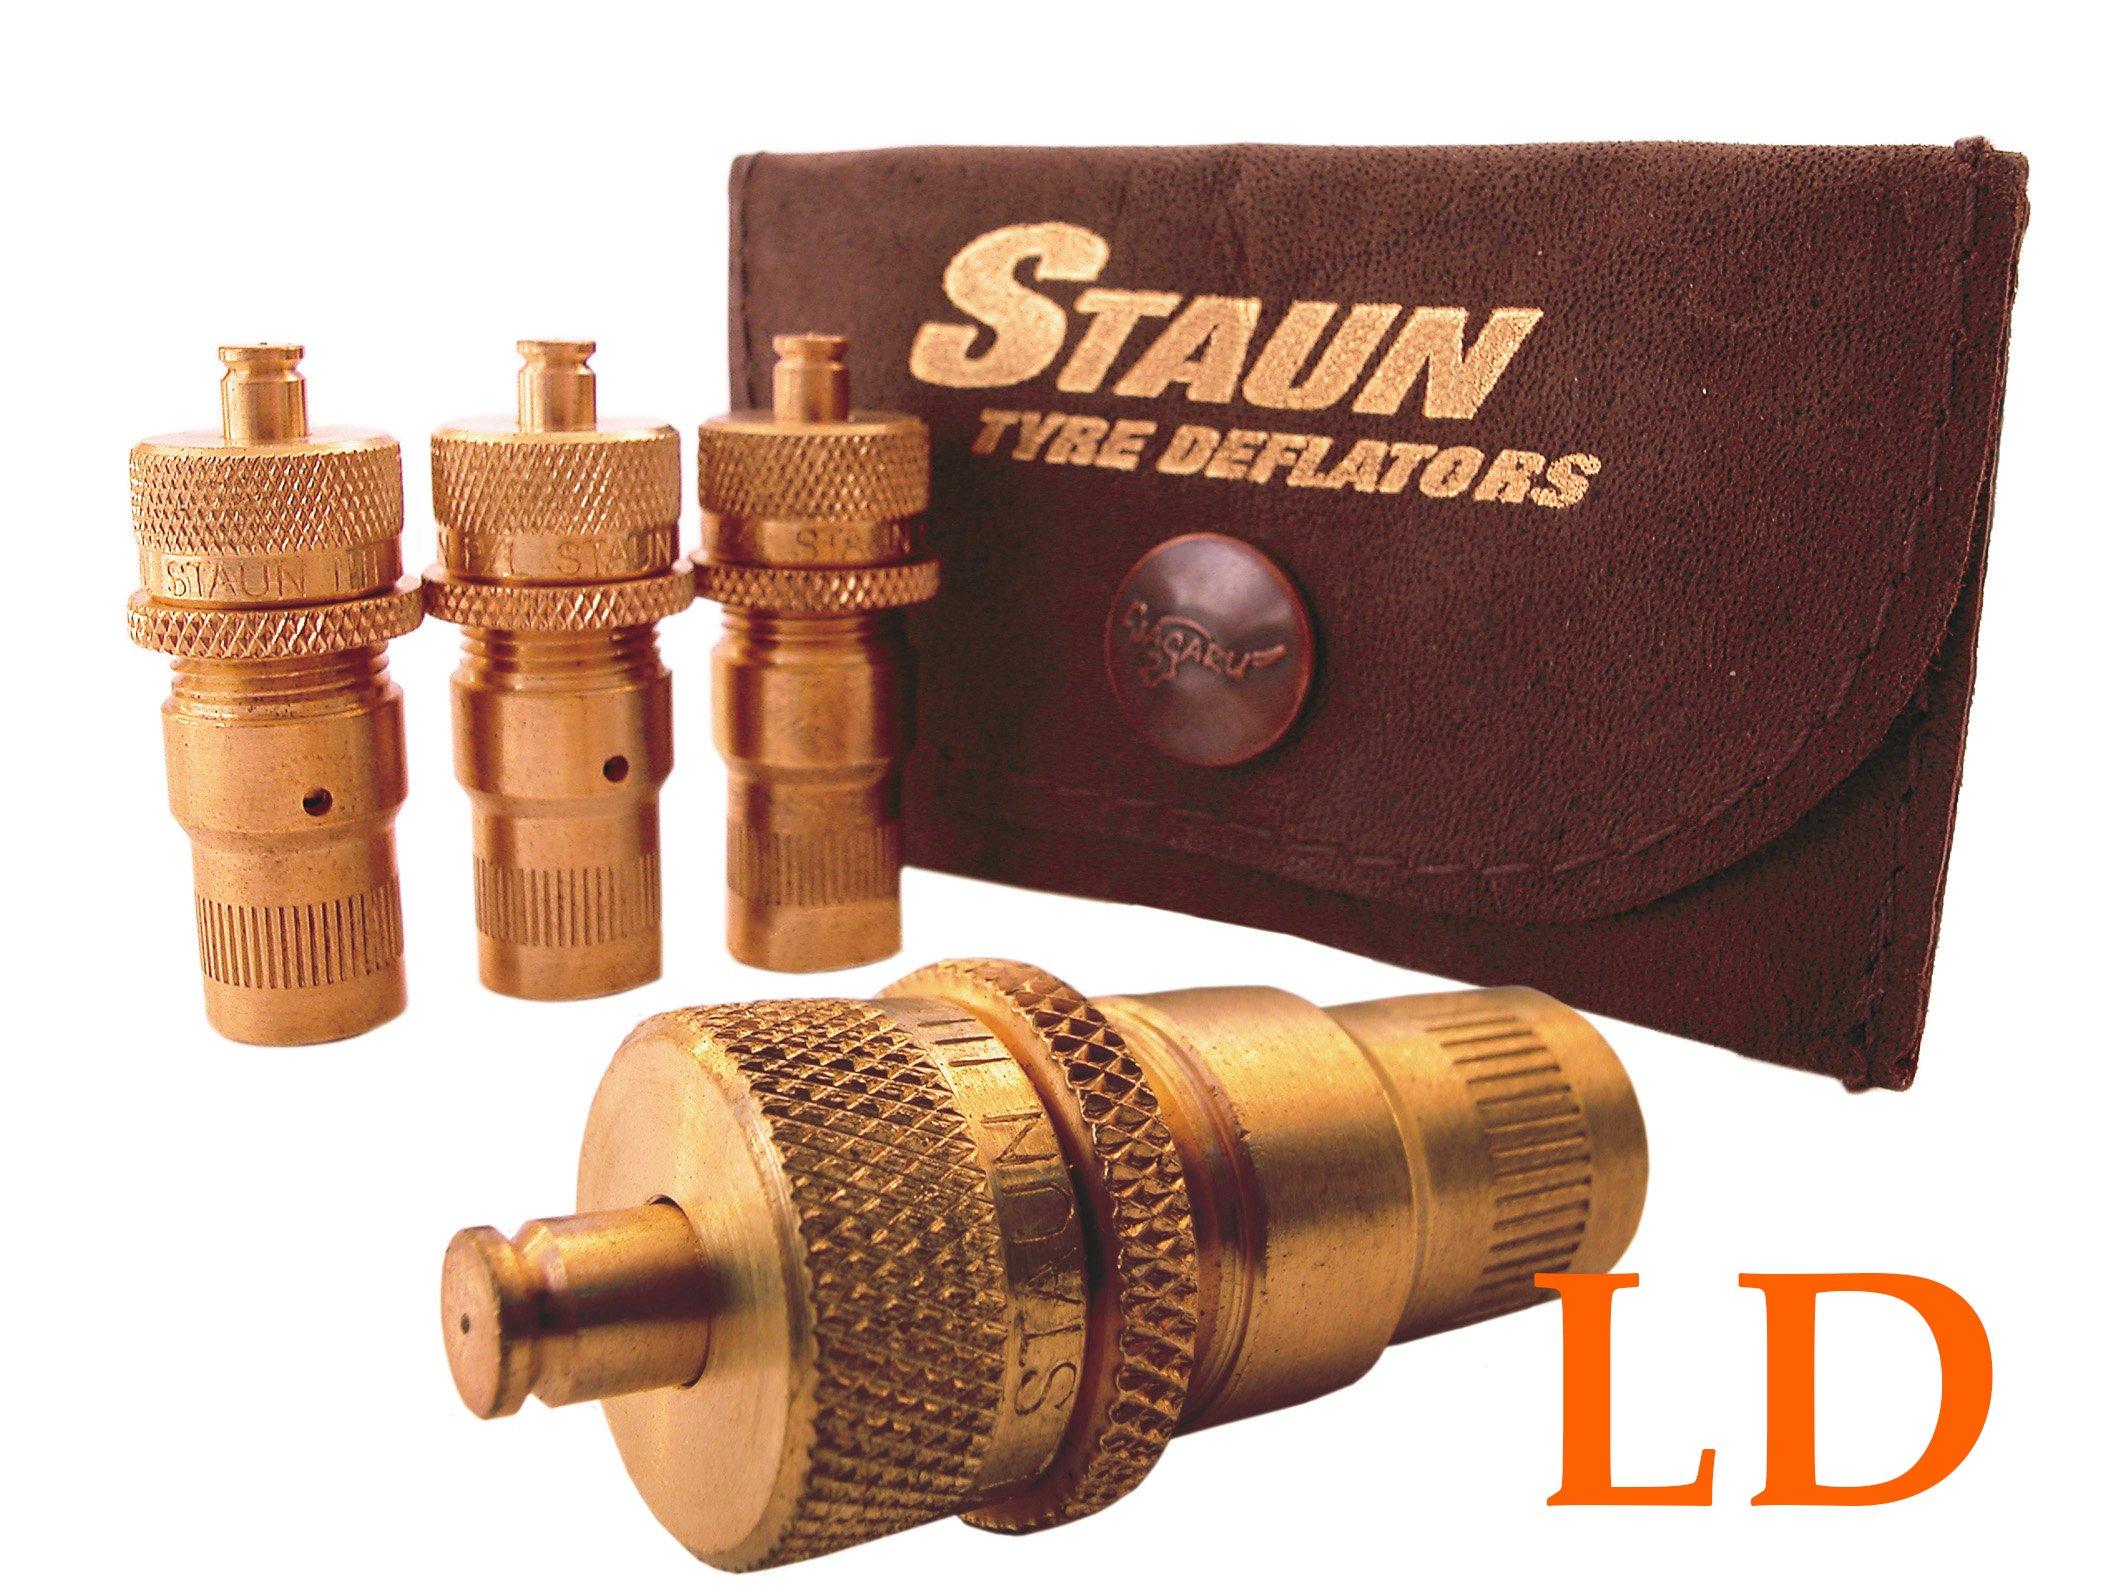 Staun Automatic Tire Deflators (Light Duty 1-10 PSI)